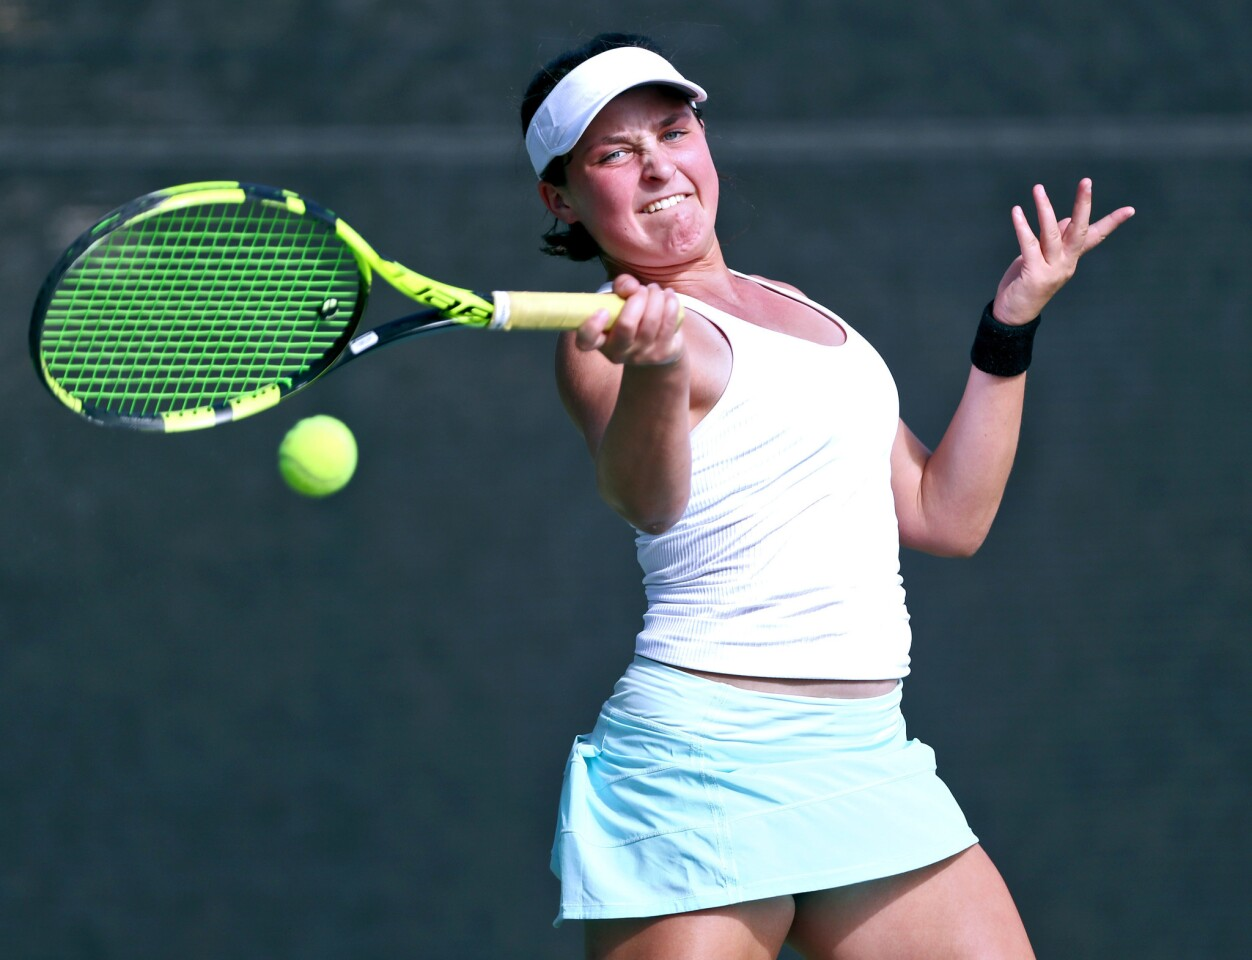 Photo Gallery: Corona del Mar vs. Encinitas San Dieguito in the CIF/USTA Southern California Regional girls' tennis quarterfinals